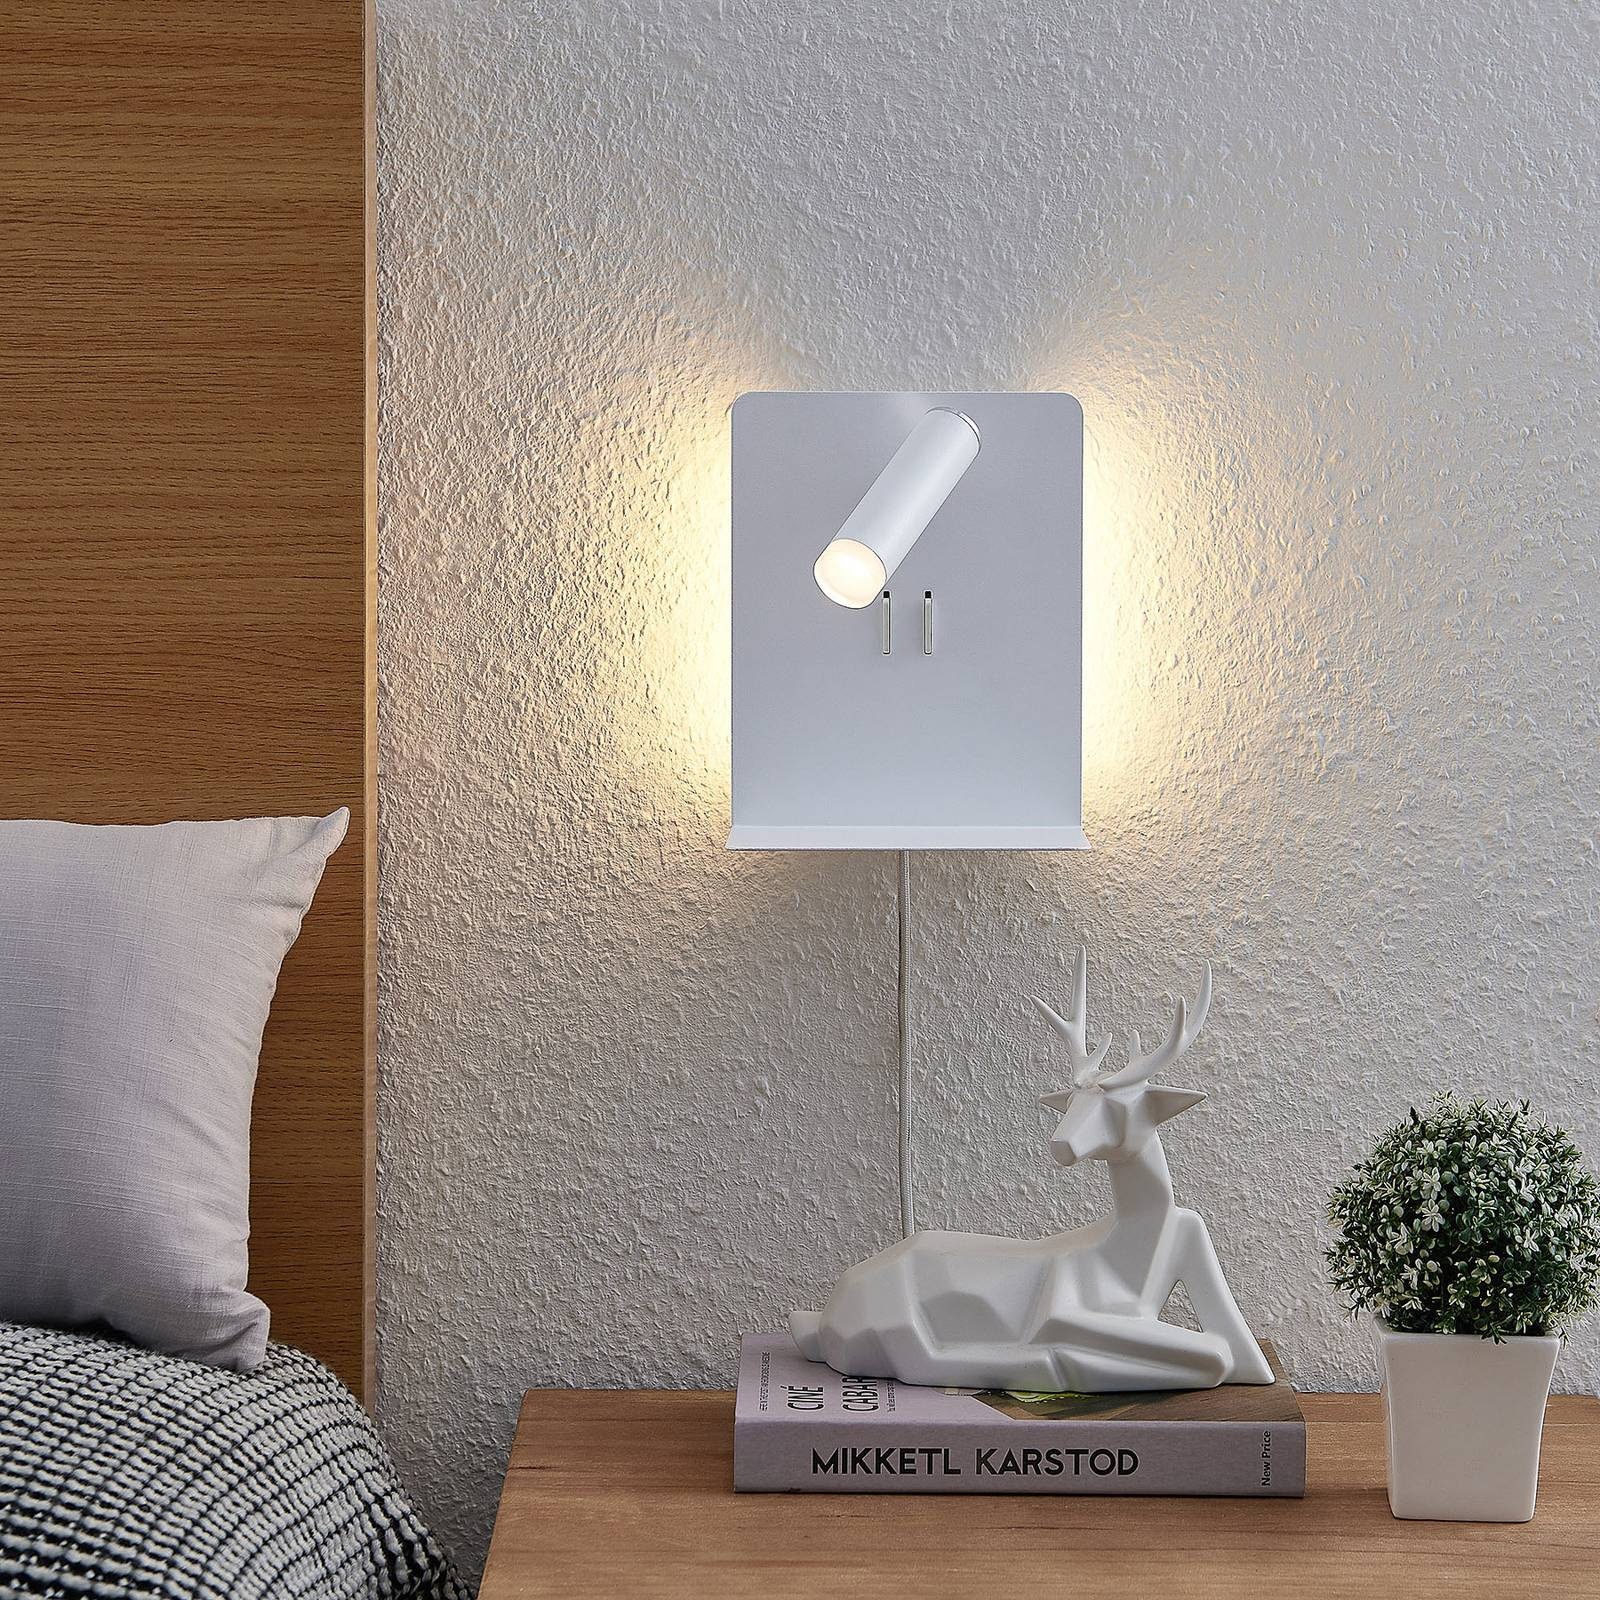 Lucande Zavi-LED-seinäspotti, taso, USB, valkoinen